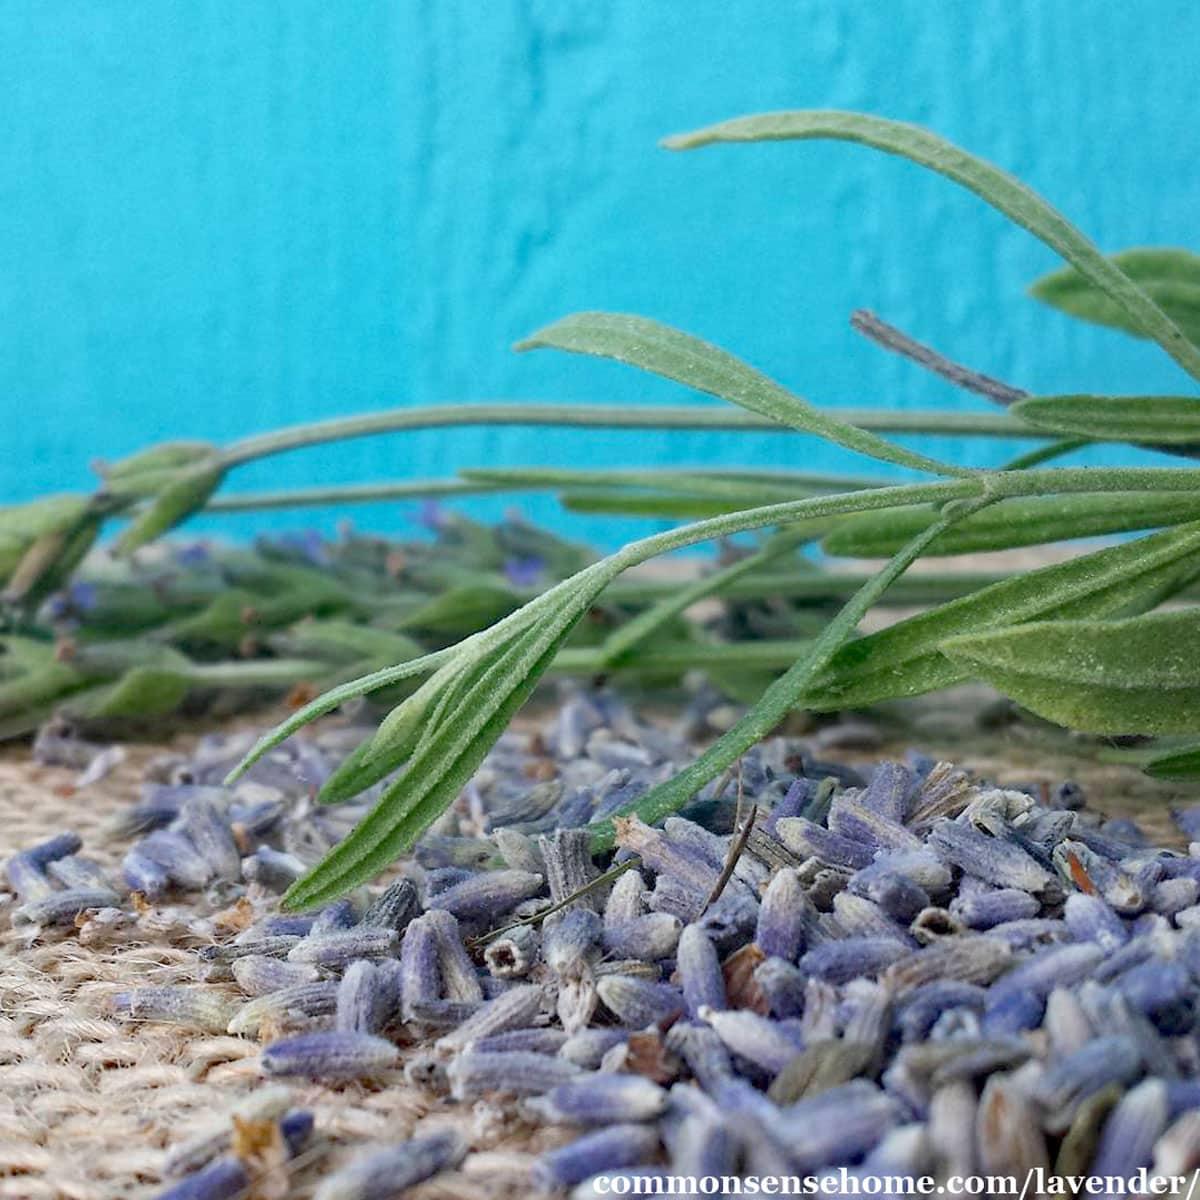 Lavandula angustifolia leaves and dried flowers